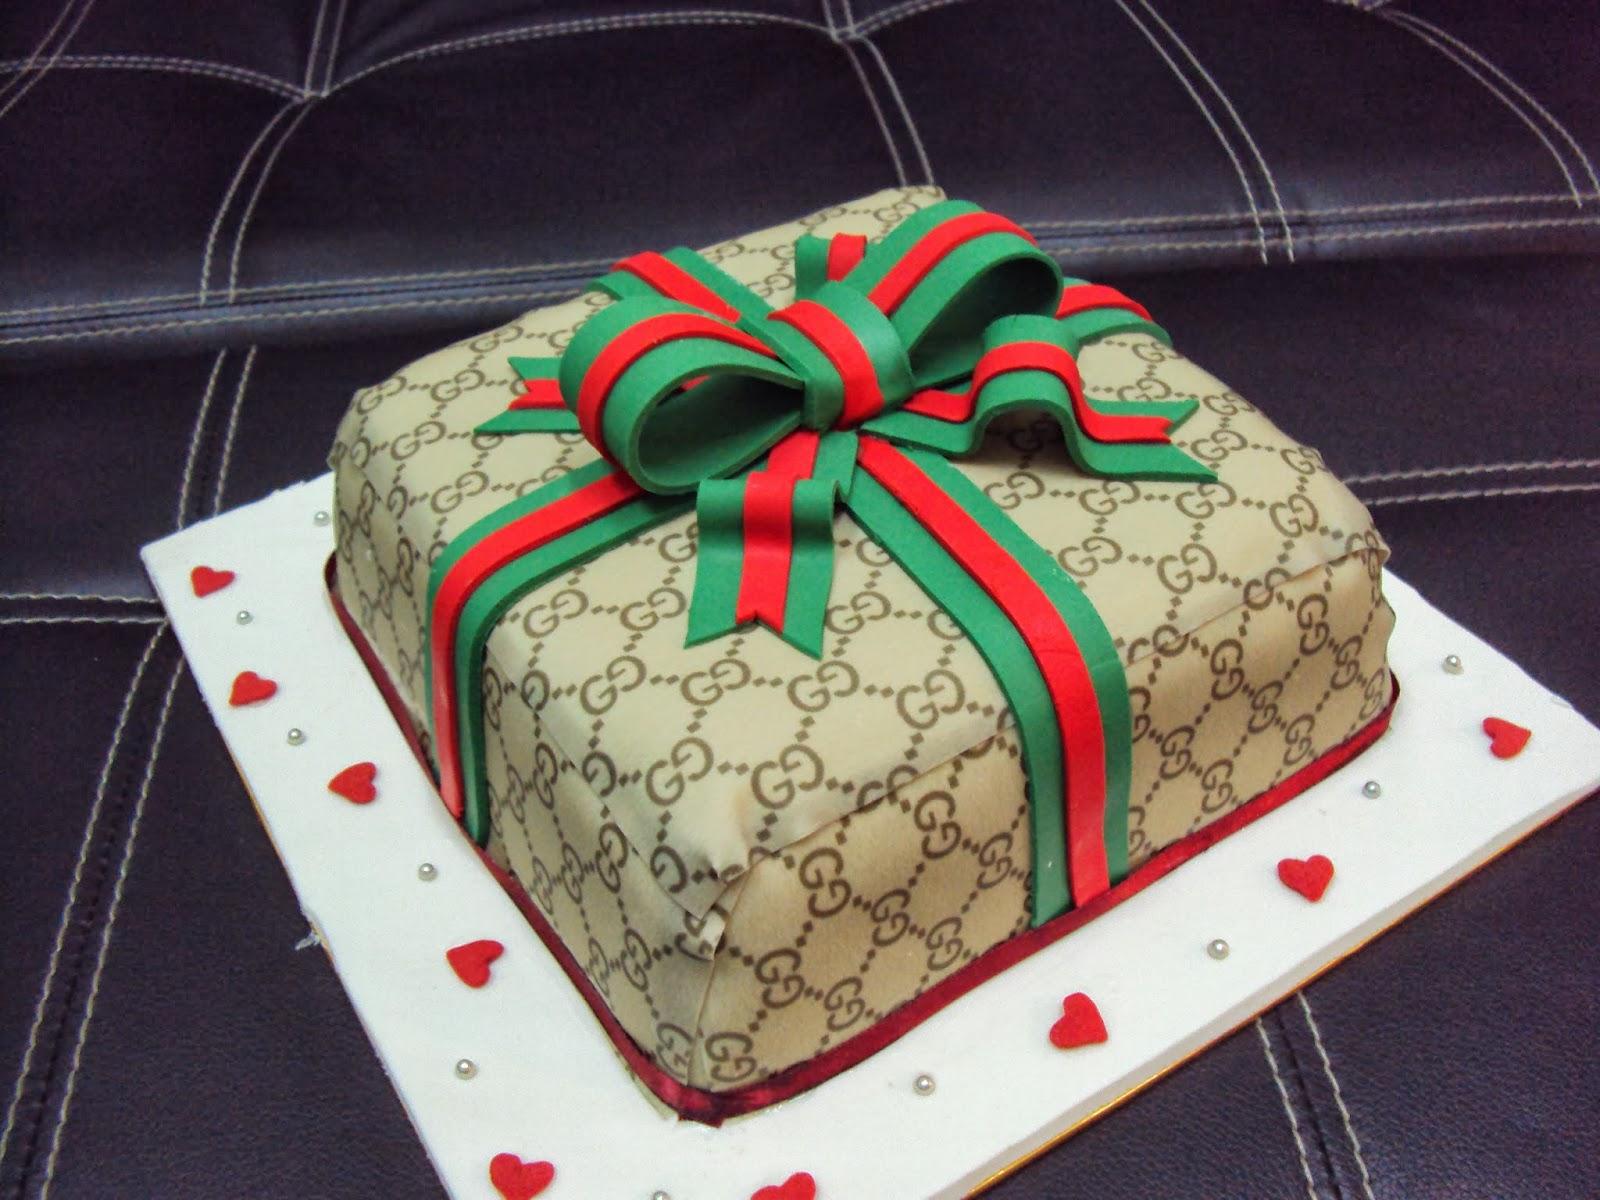 Cake Designs No Fondant : L mis Cakes & Cupcakes Ipoh Contact : 012-5991233 : Gucci ...